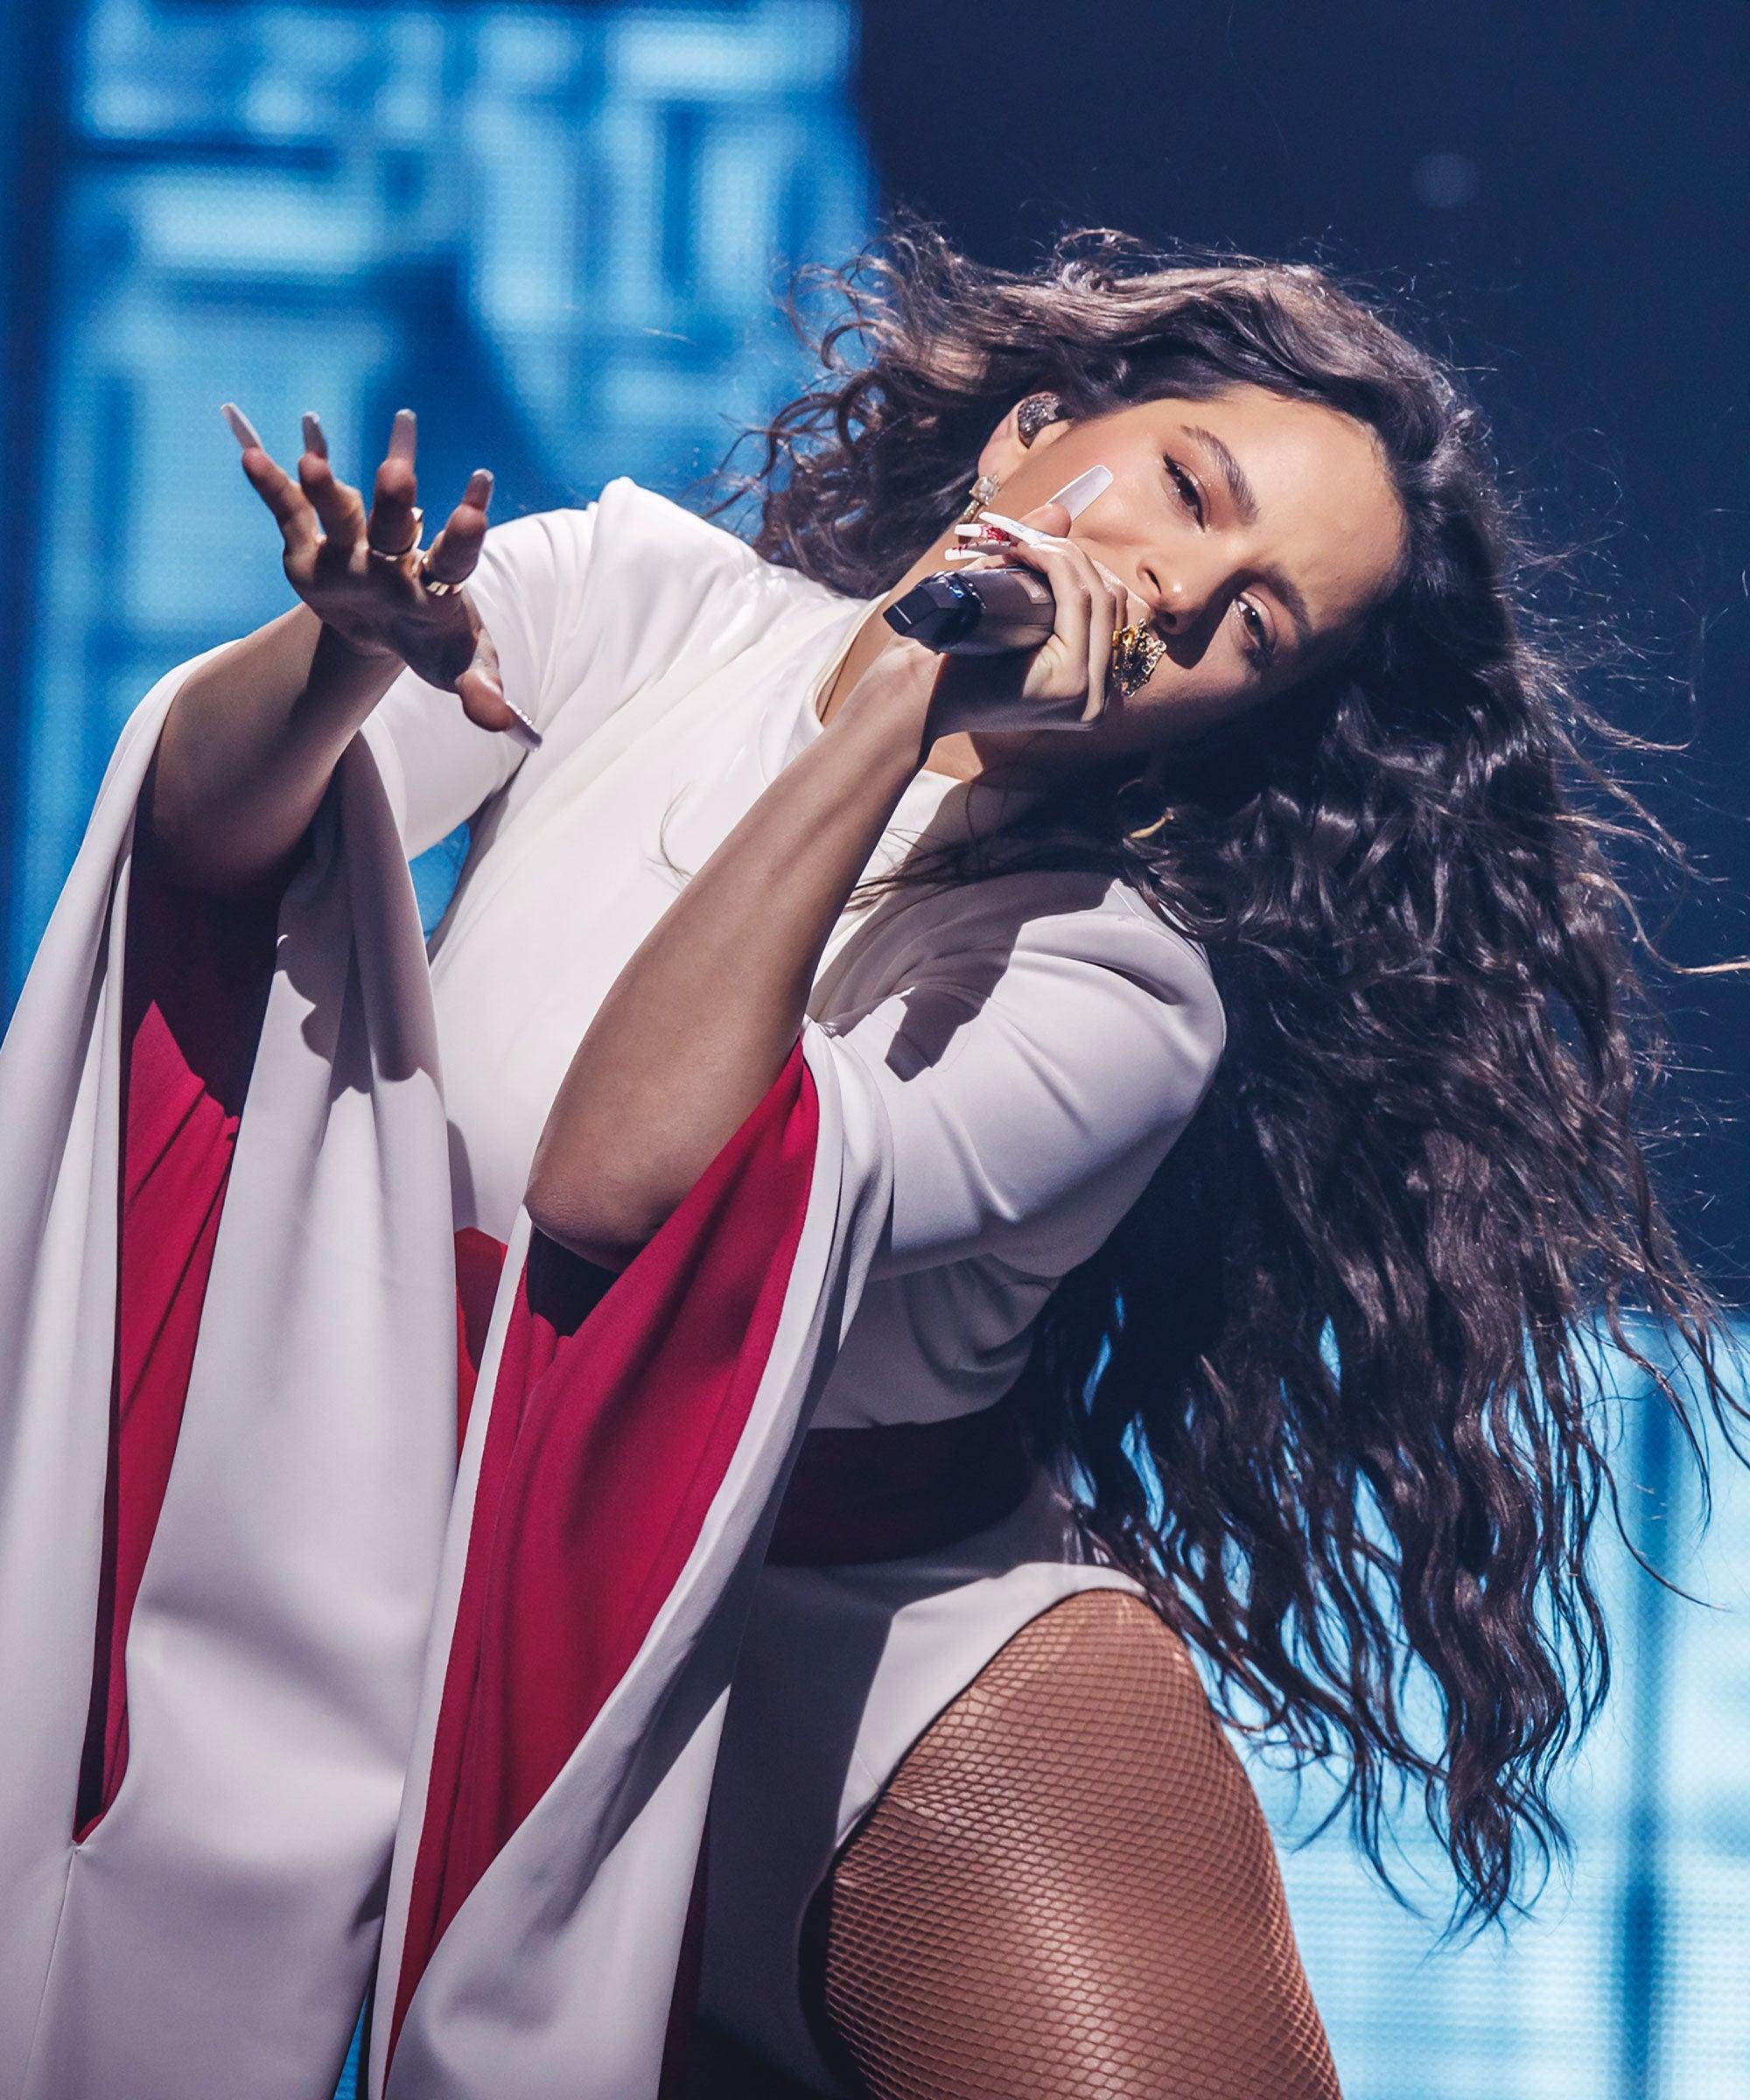 Who Is Rosalia Grammy Awards 2020 Performance